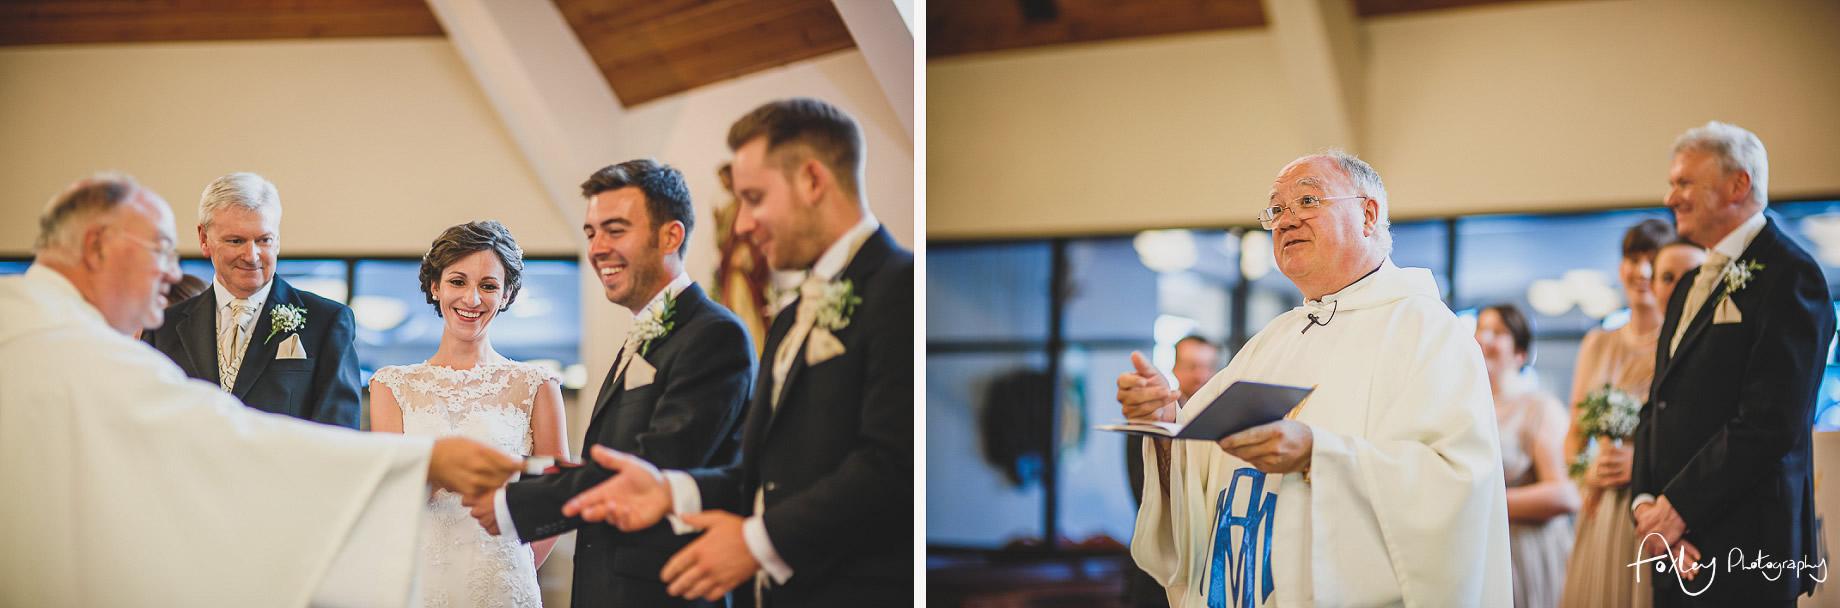 Rebecca and Dan Wedding at Preston Marriott Hotel 060